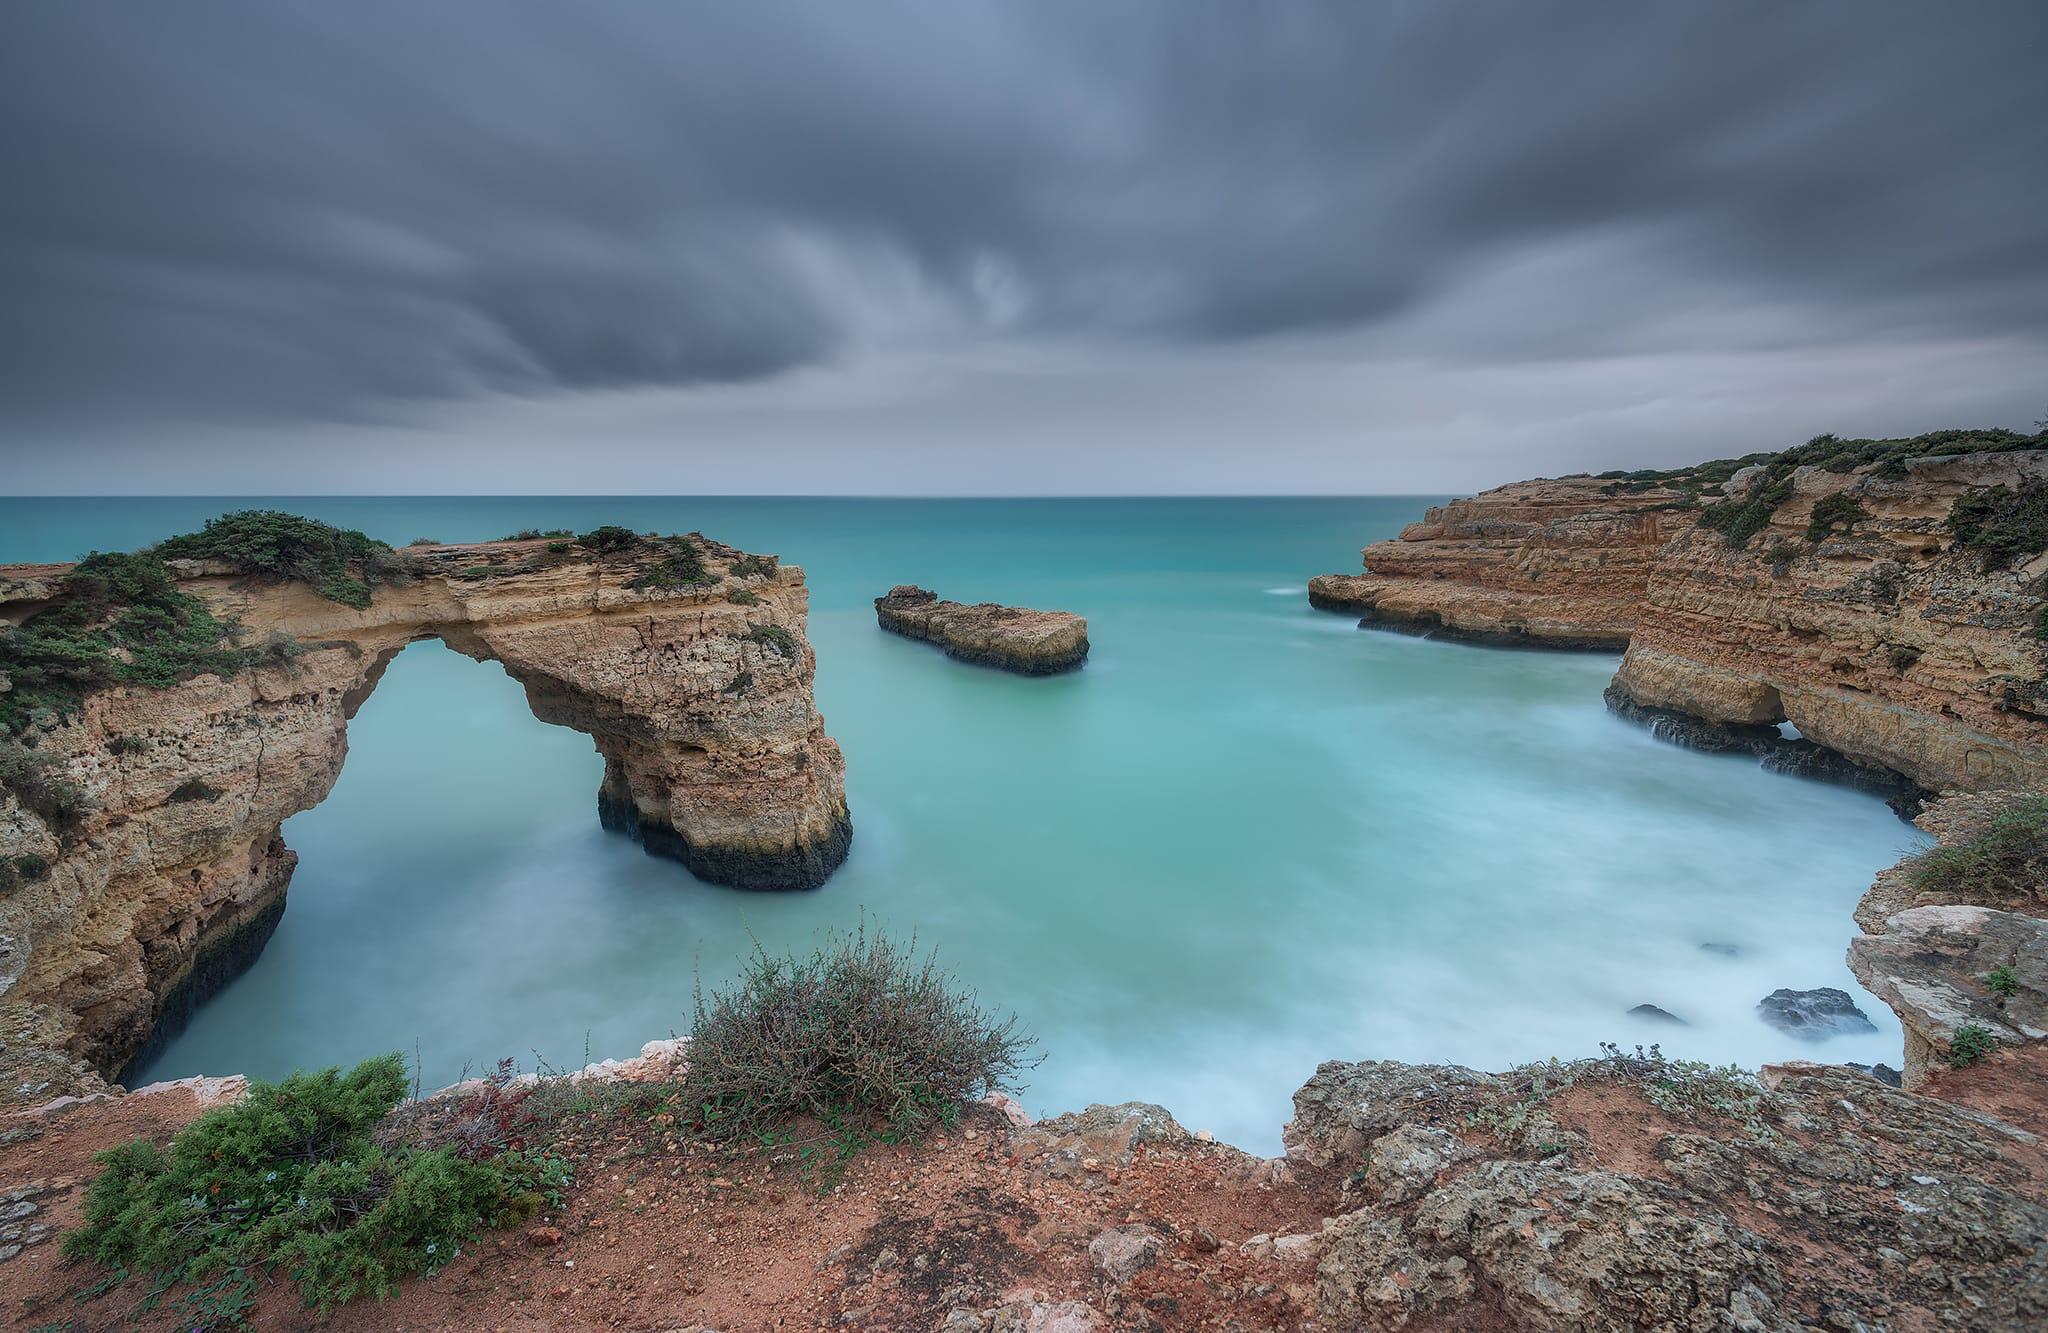 DSC_0705-2048 Francesco Gola Long Exposure Storm Algarve Portugal Blue Albandeira Seascape